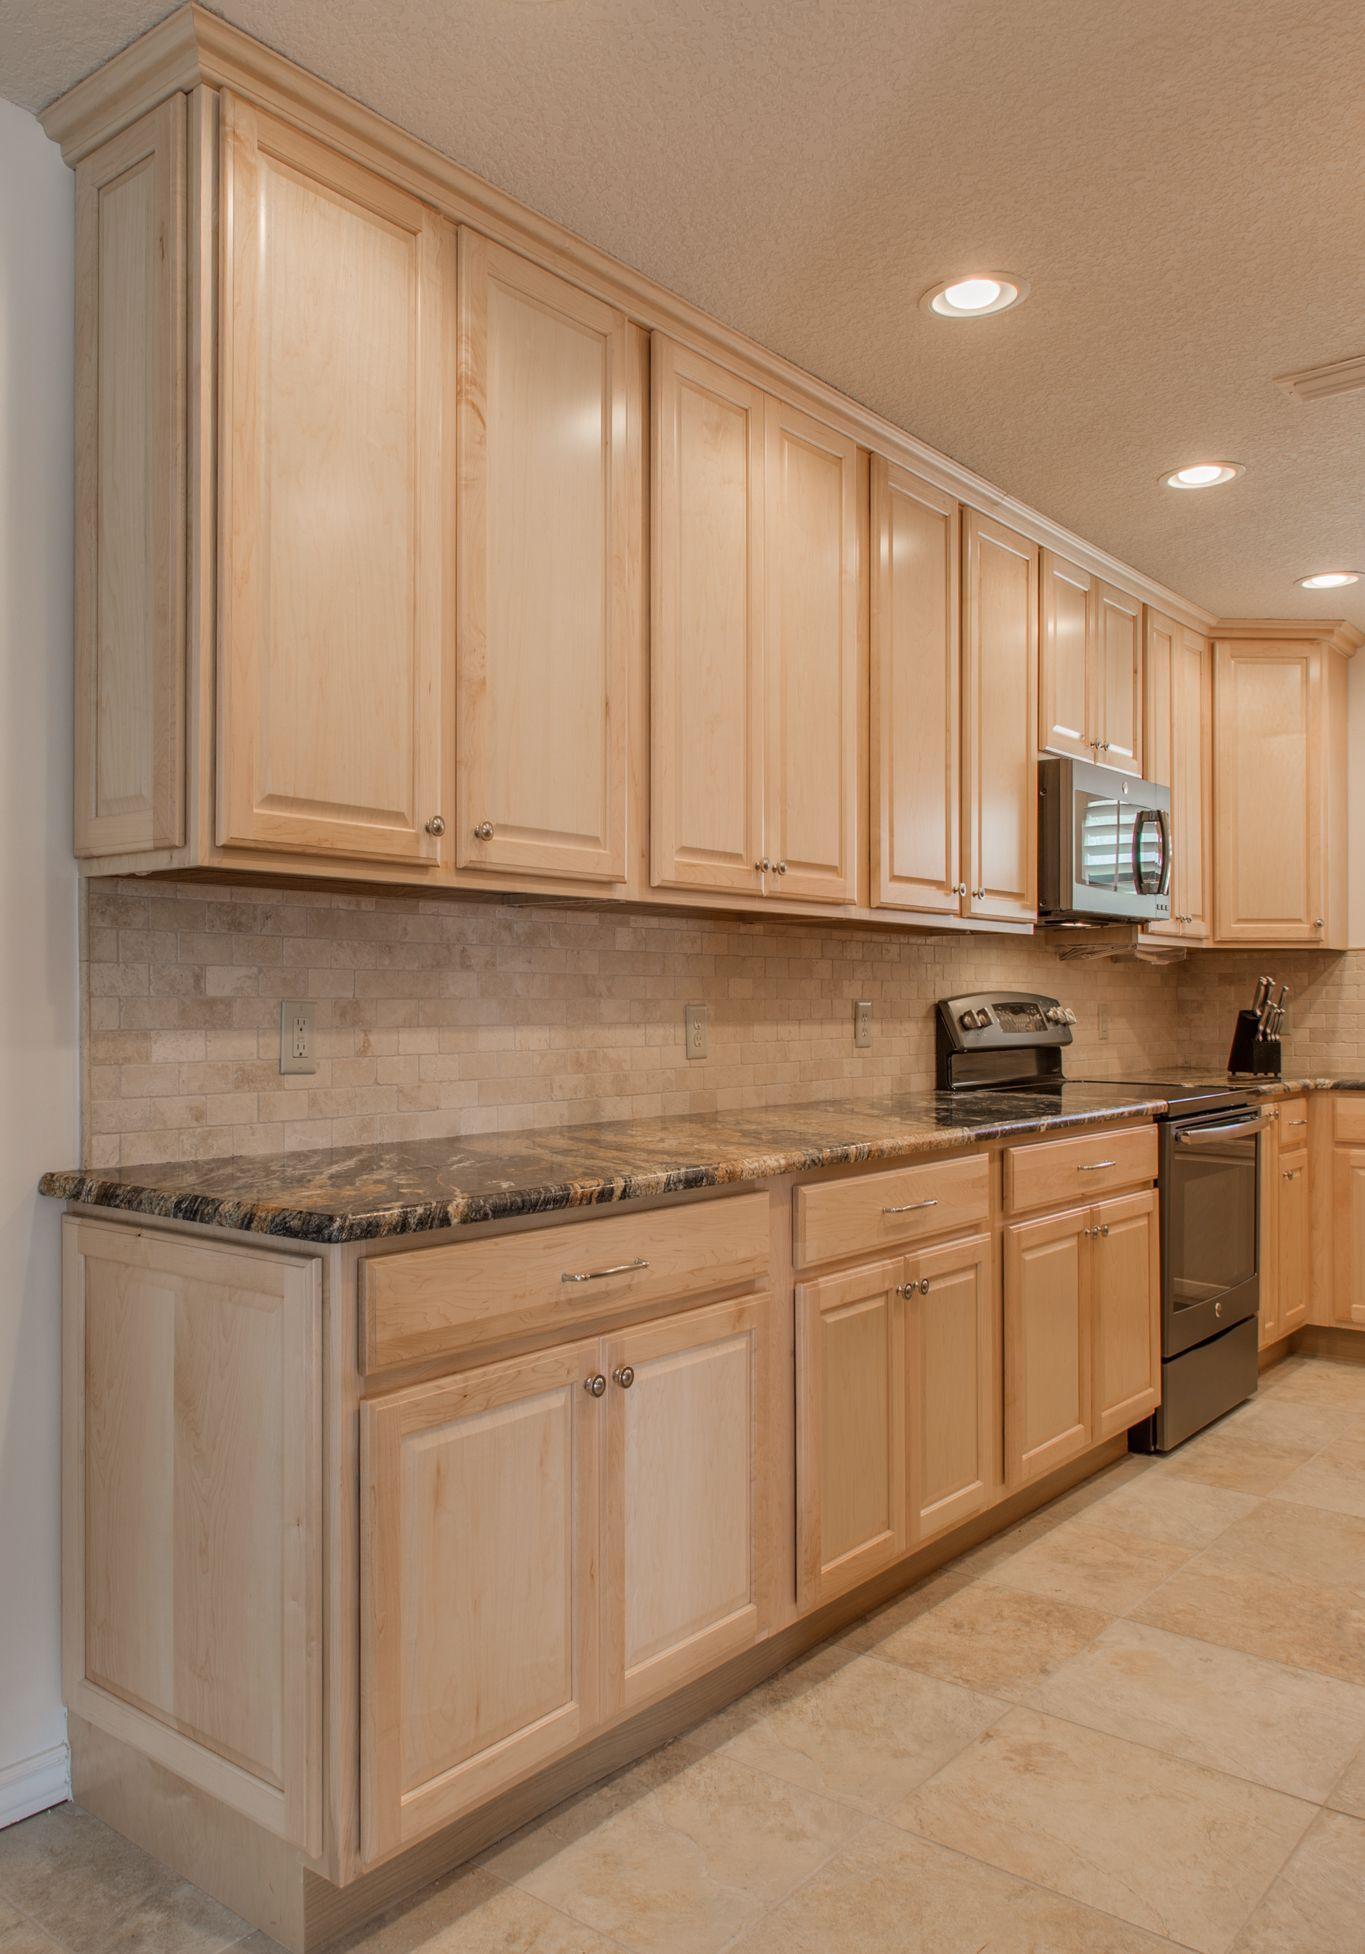 Merillat Classic Seneca Ridge Maple Cabinetry With All